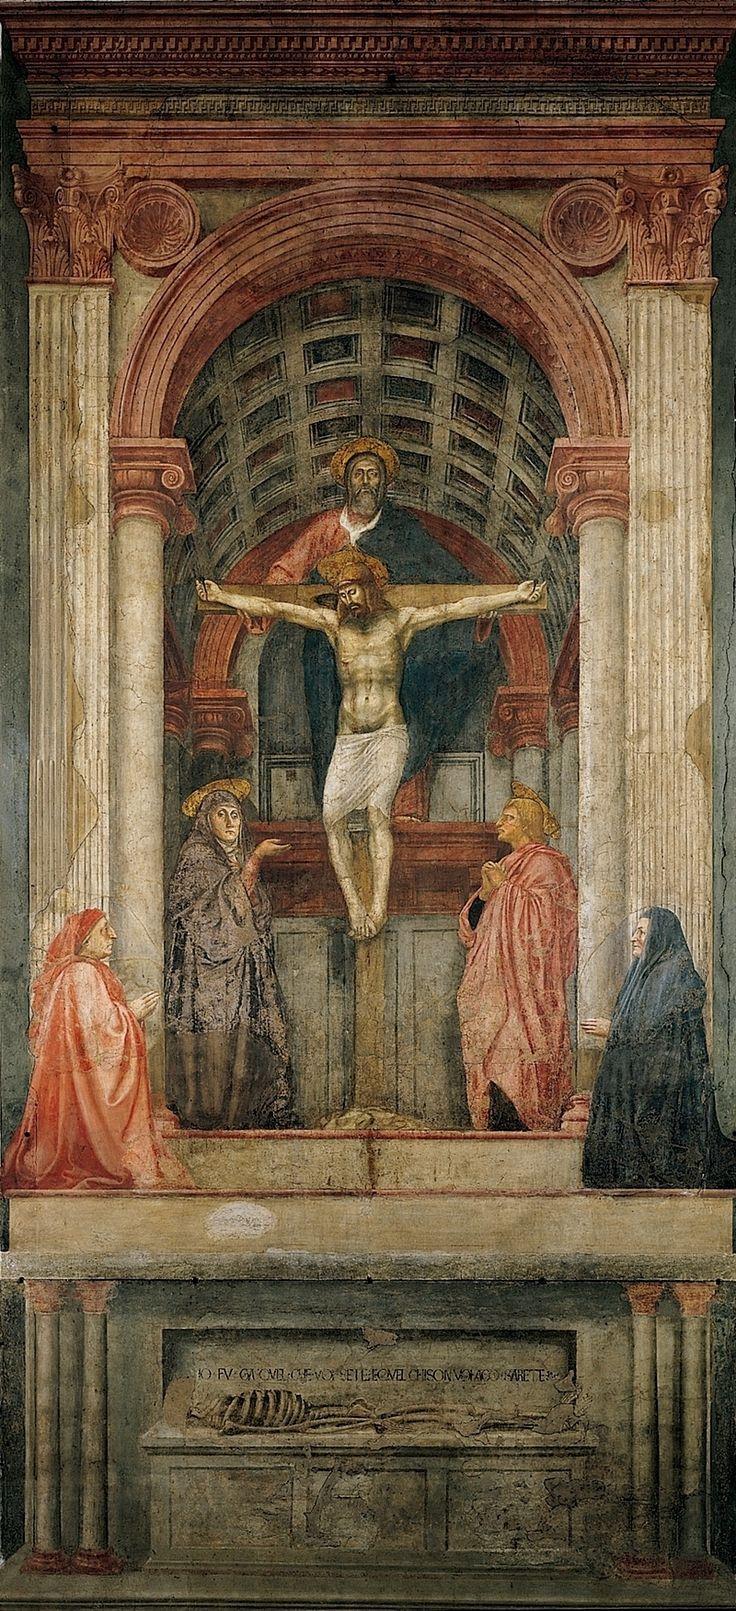 "Complete Interpretation and Analysis ""the Holy Trinity"" by Masaccio (trinità, 1425) in Florence - Picture Description"